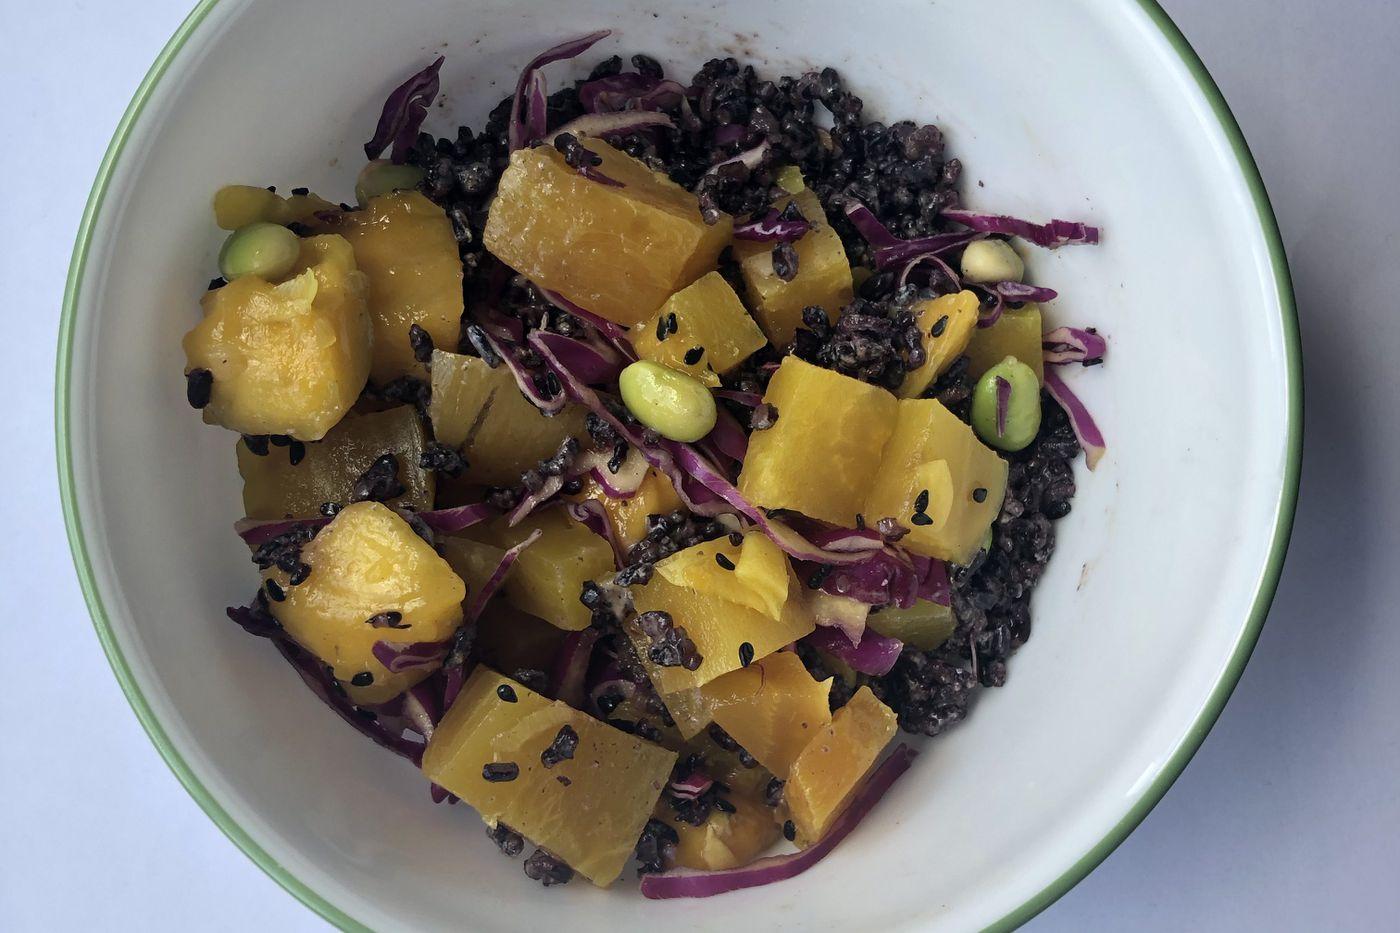 Vegan 'poke' bowls with mango and beets